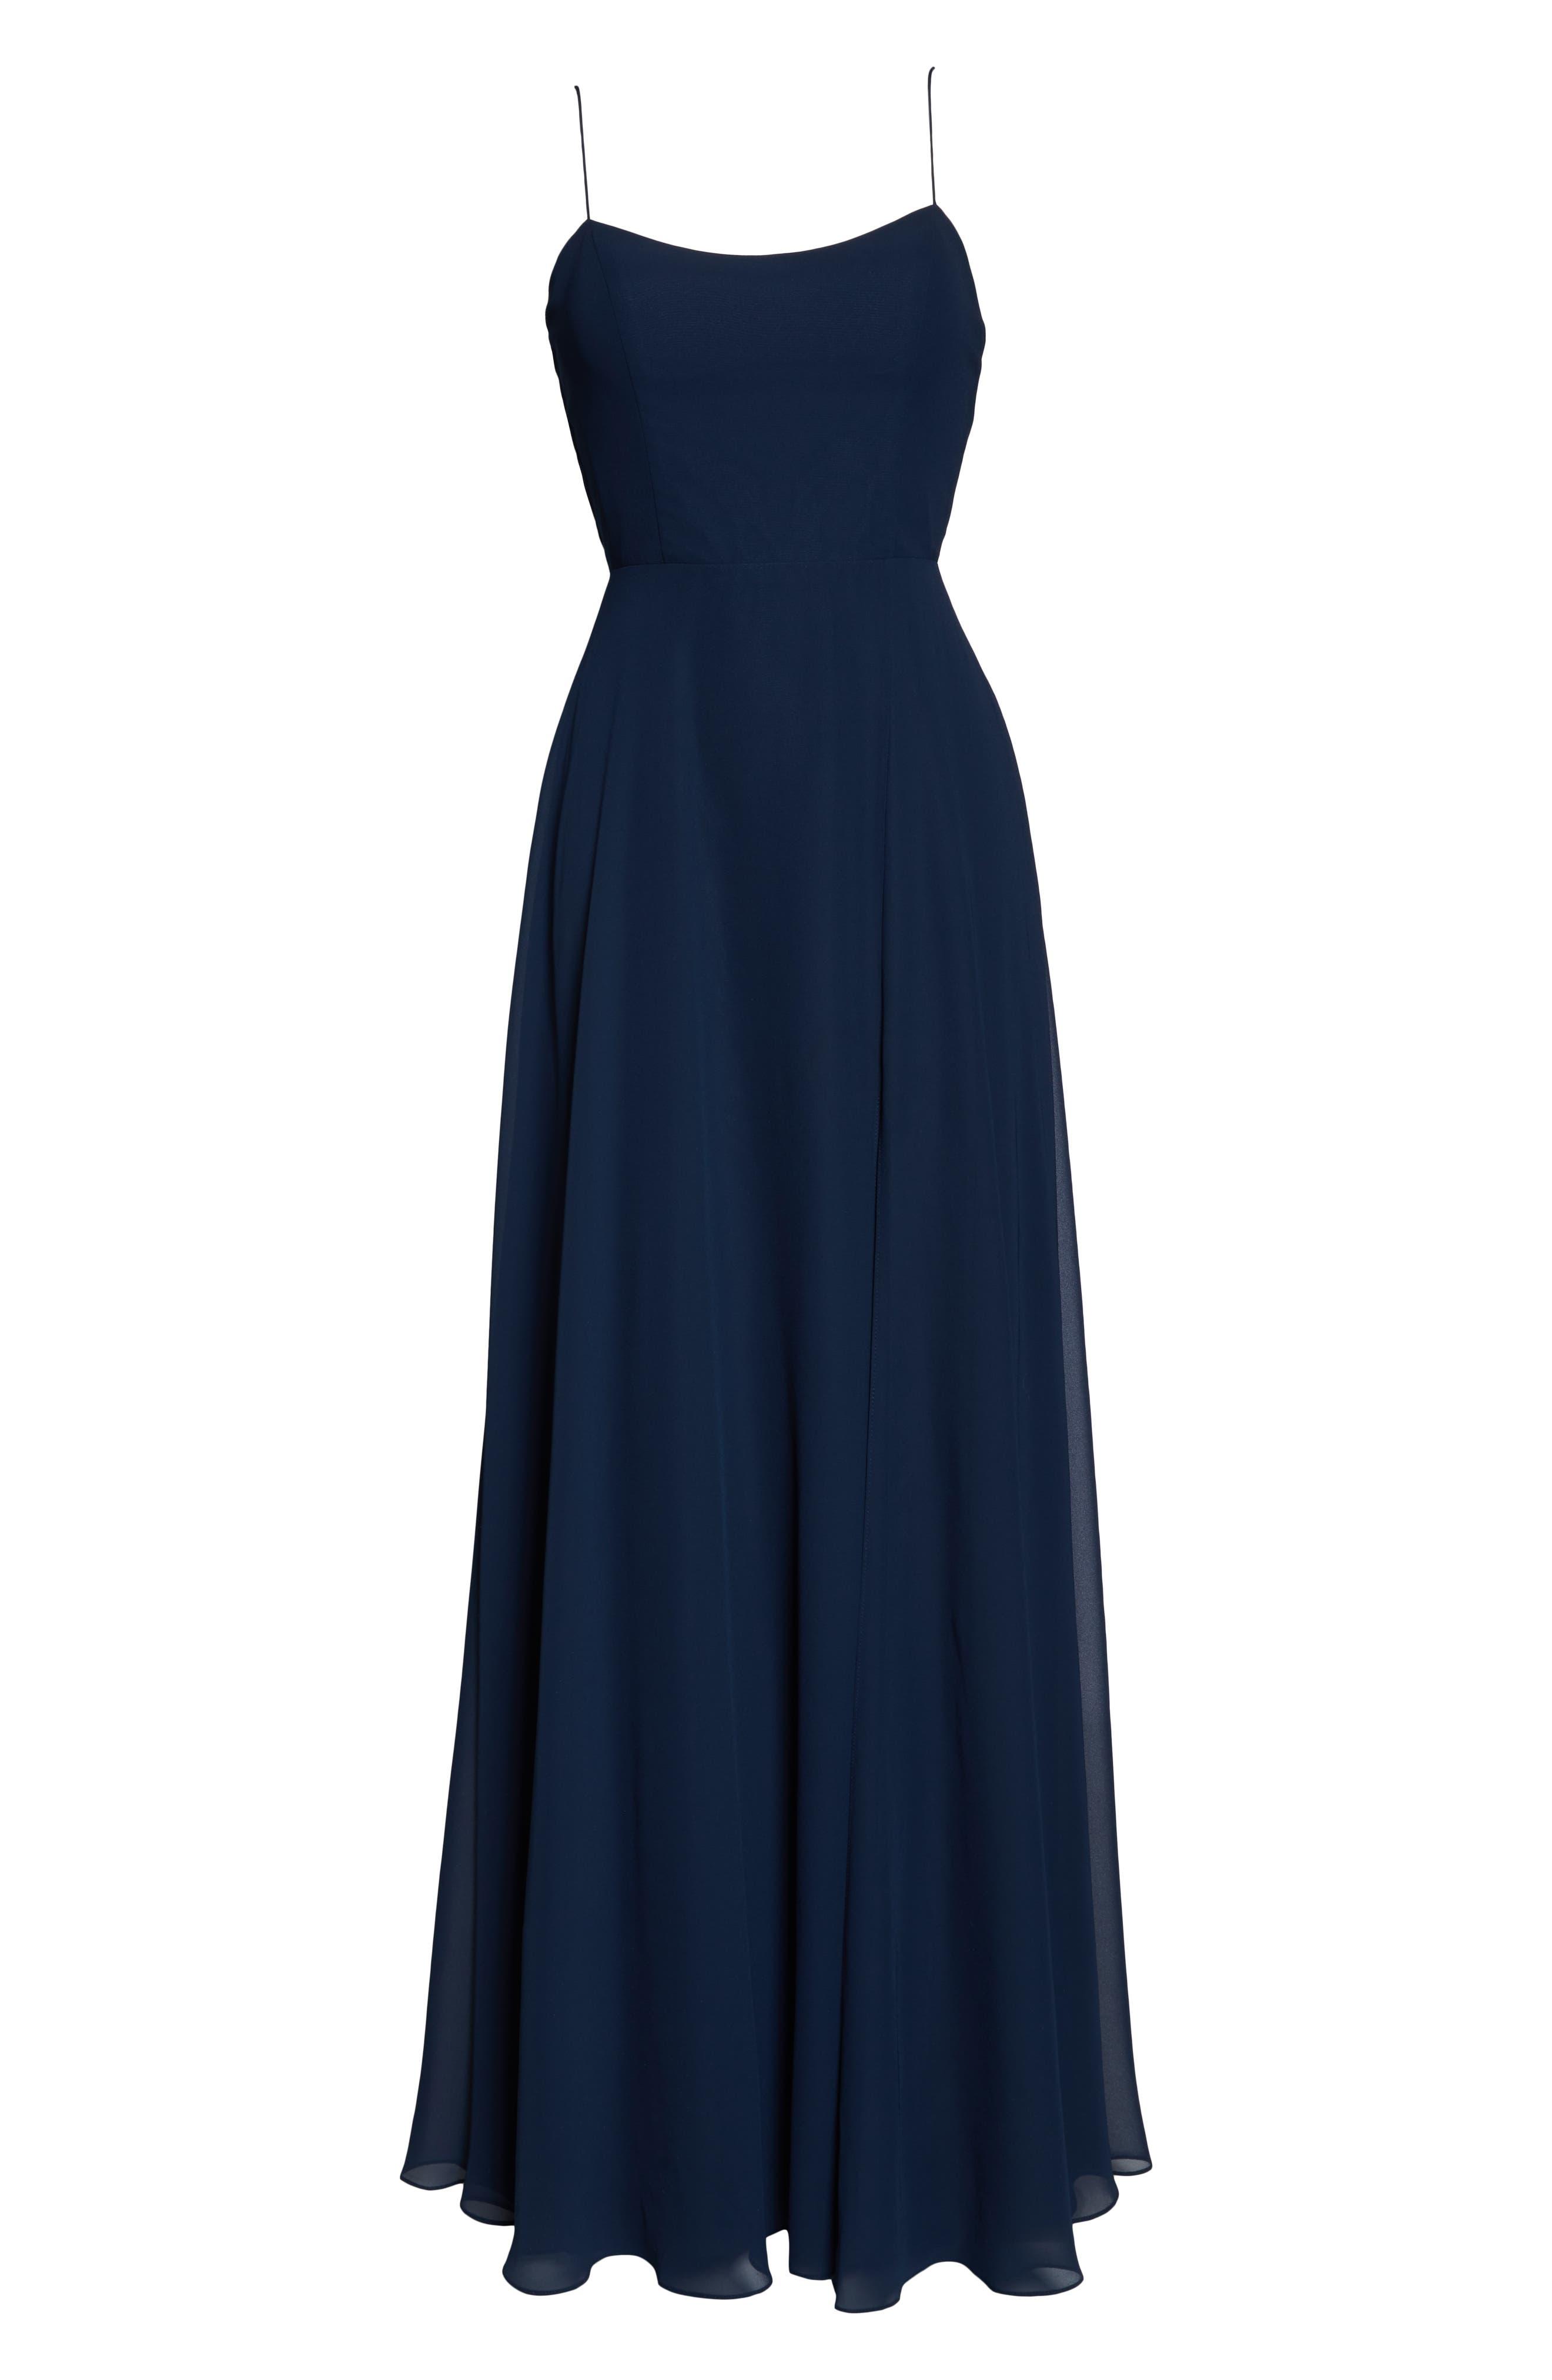 Kiara Bow Back Chiffon Evening Dress,                             Alternate thumbnail 6, color,                             NAVY